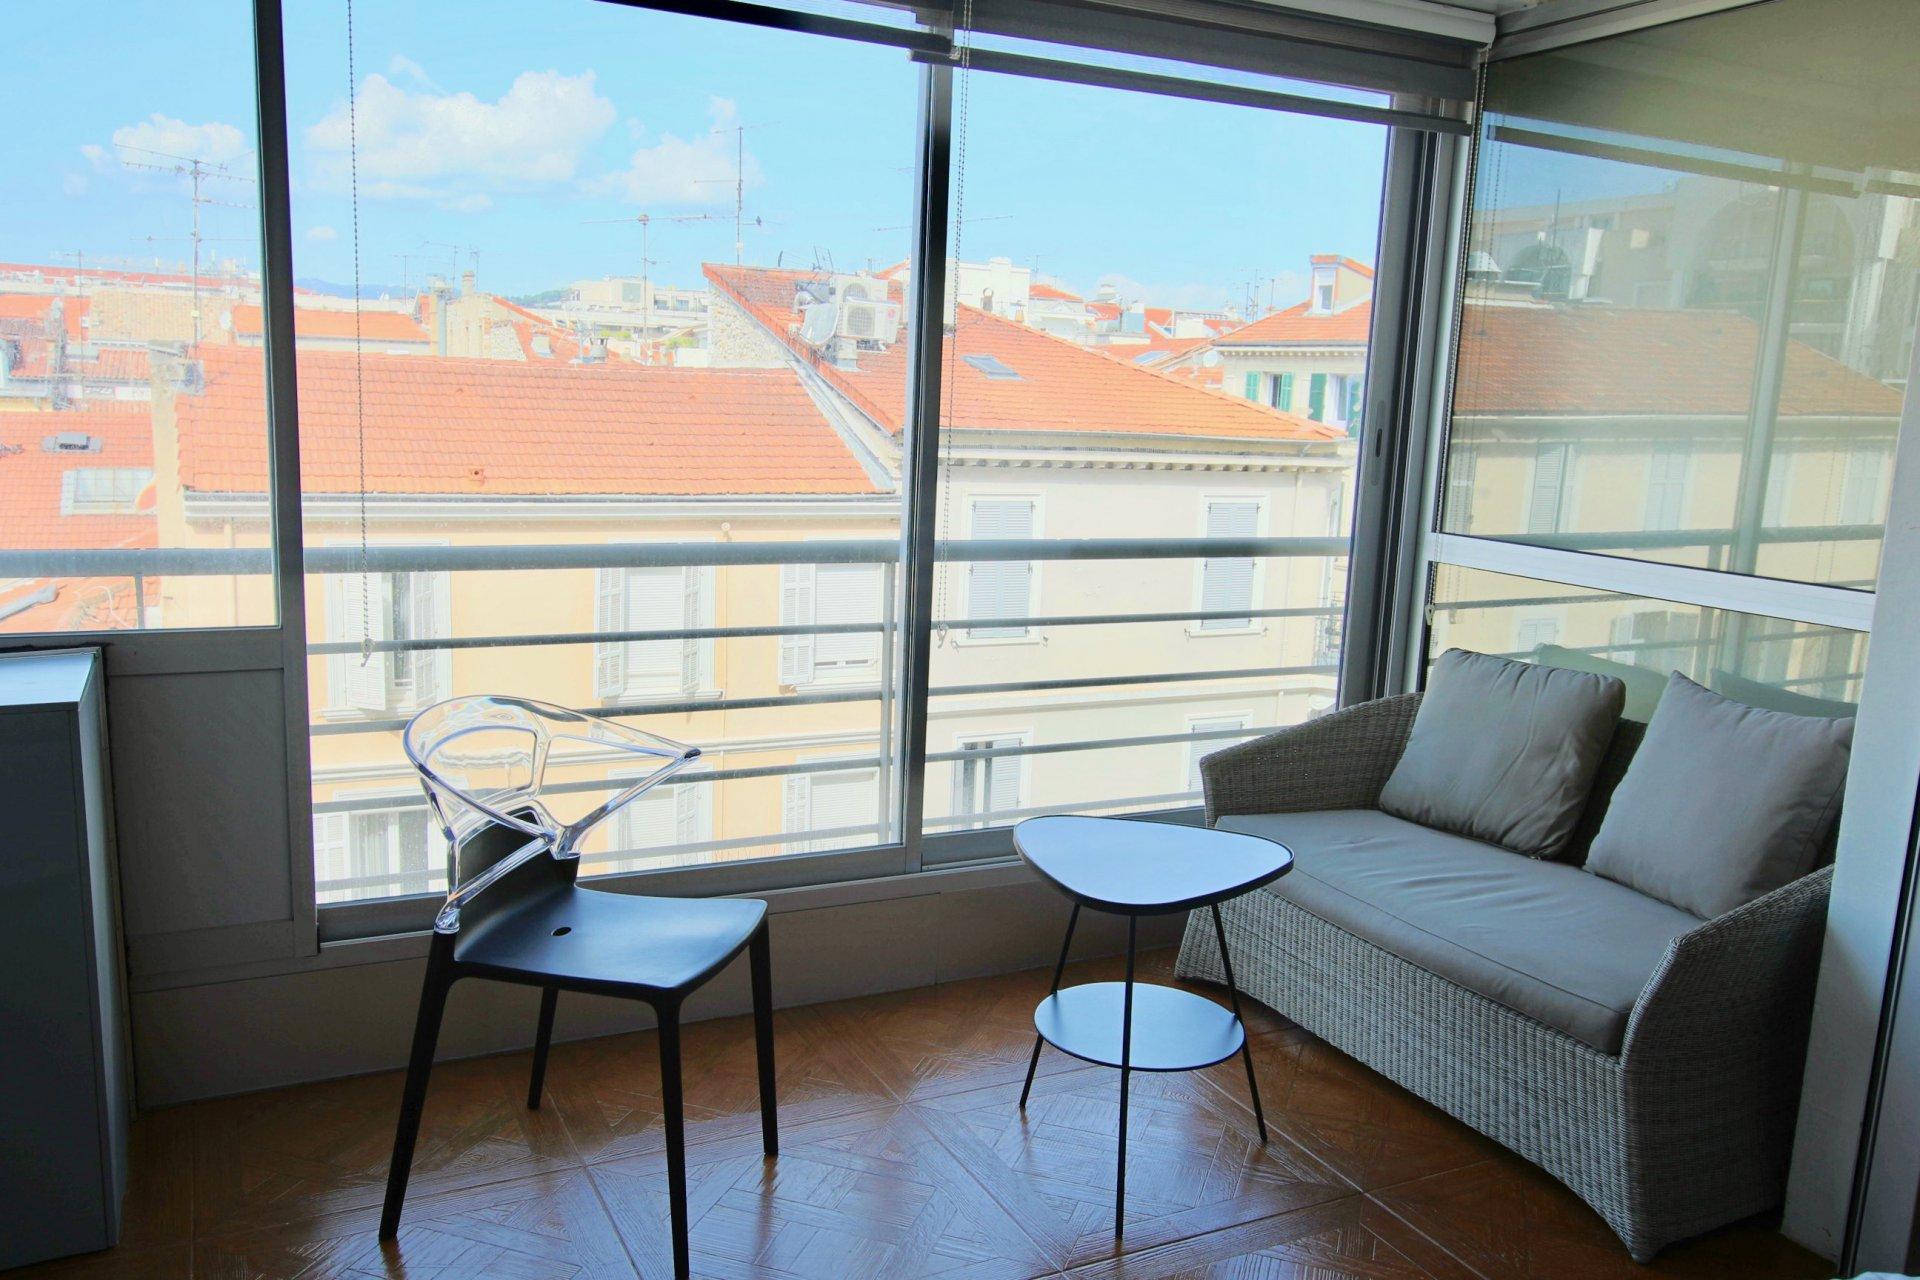 Studio / appart'hôtel - Cannes-Grand-Hôtel-